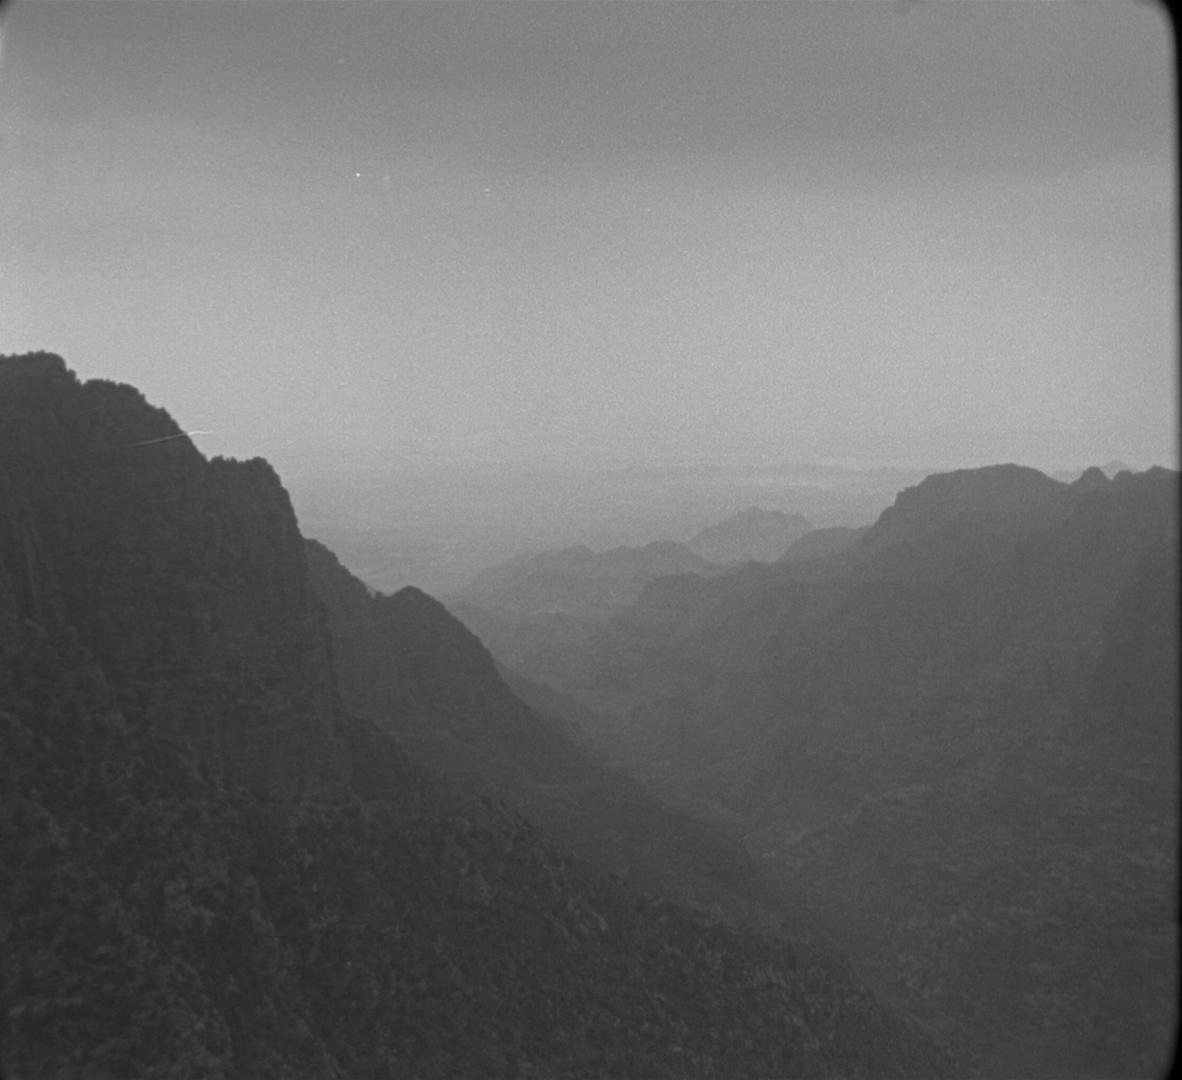 gorges prores.00_01_29_21.Image fixe004.jpg